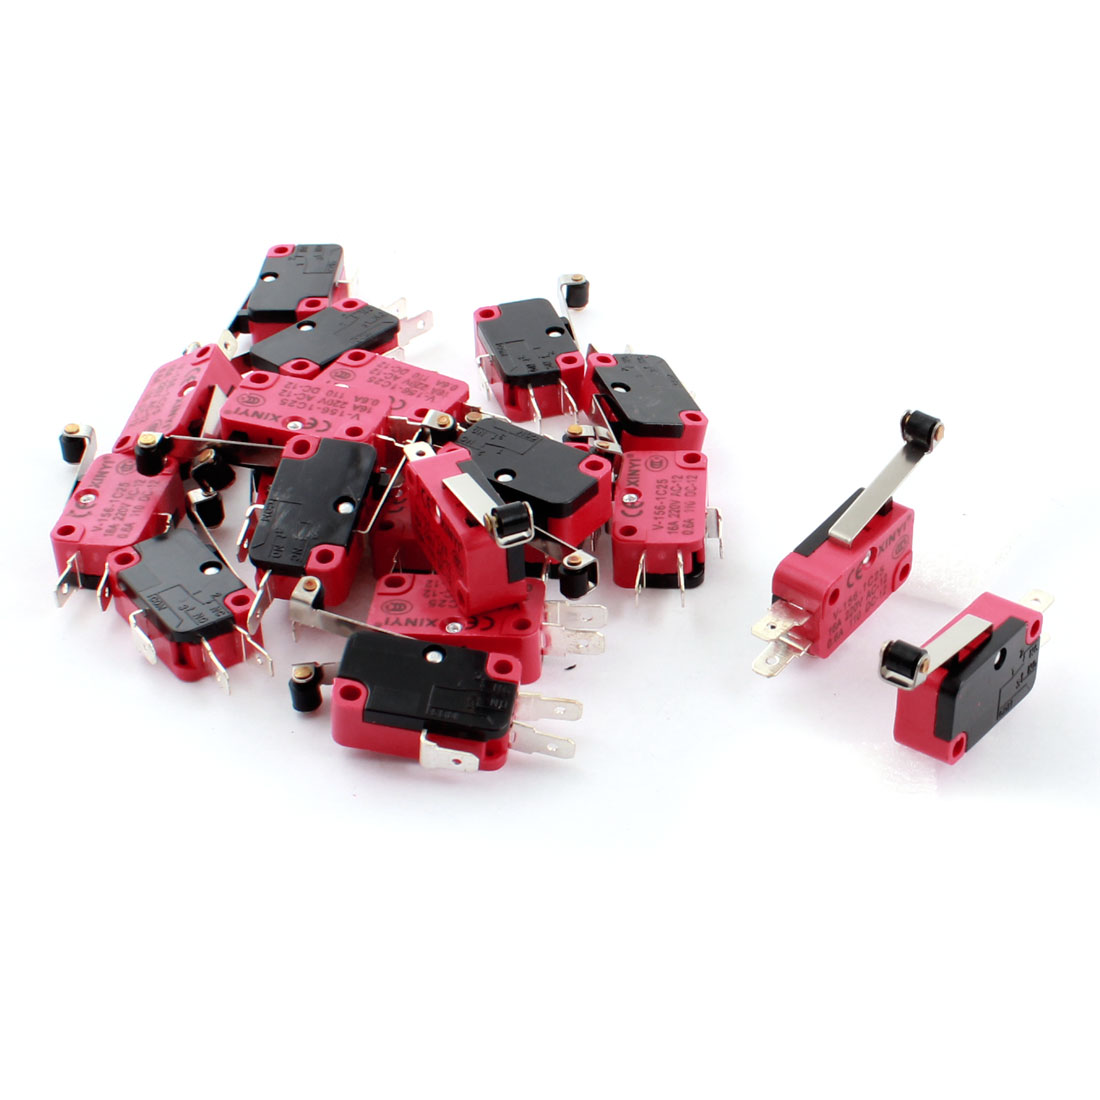 20 Pcs V-156-1C25 Micro Limit Switch Long Hinge Roller Lever Arm SPDT Snap Action LOT